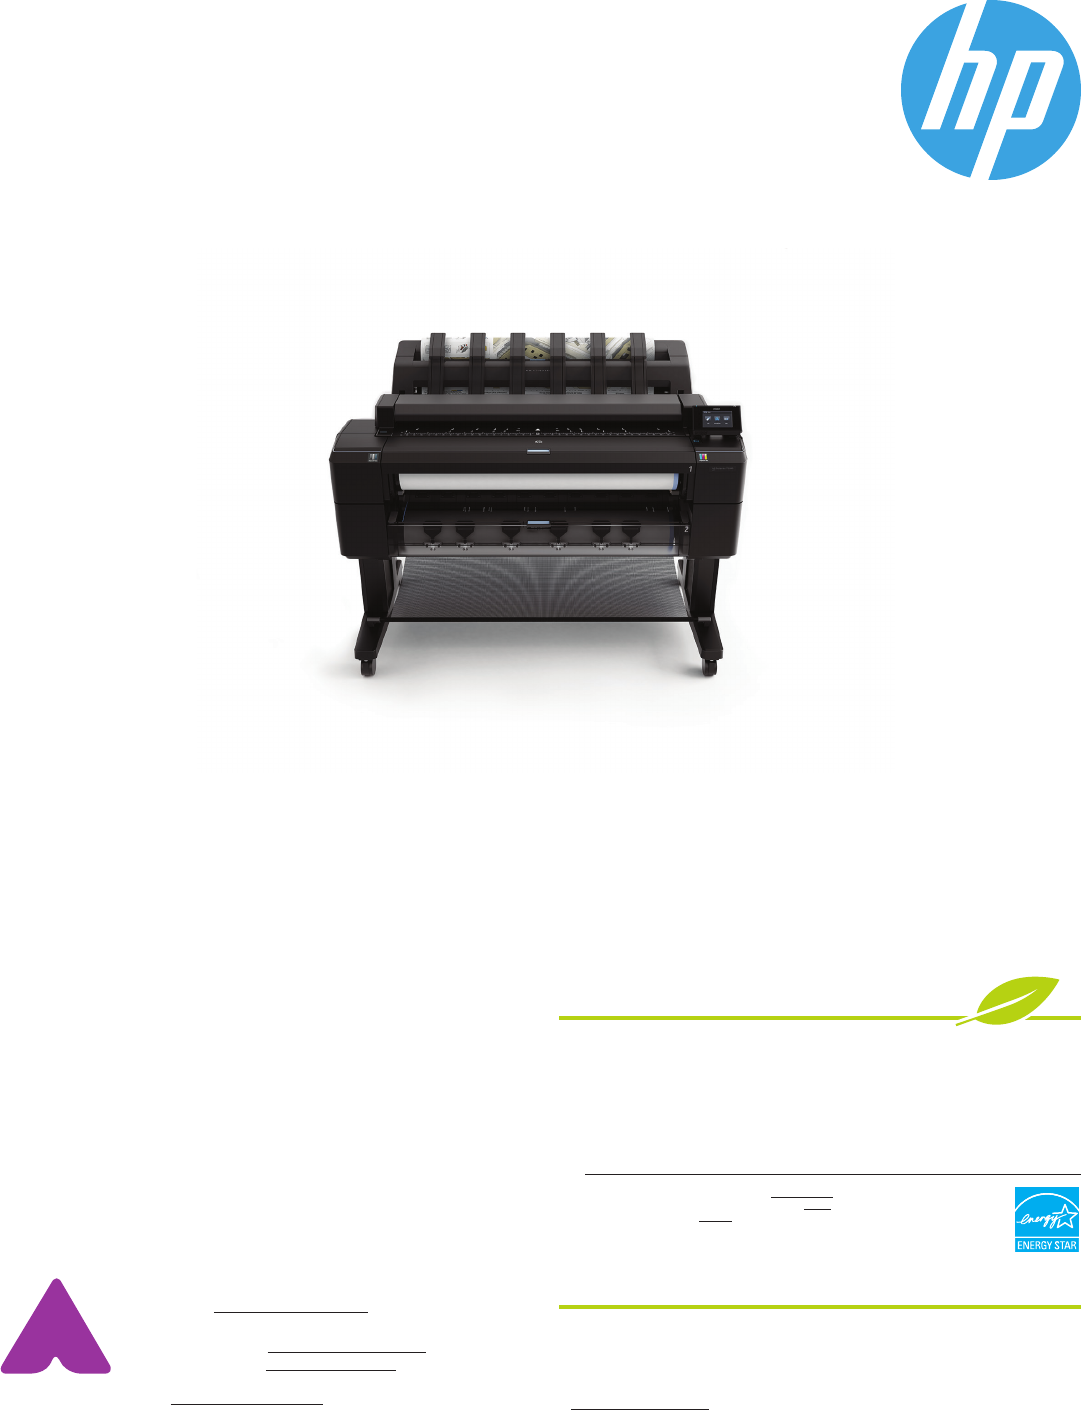 HP DESIGNJET T2500 PS Large Format Color eMultifunction 36 IN CR359A